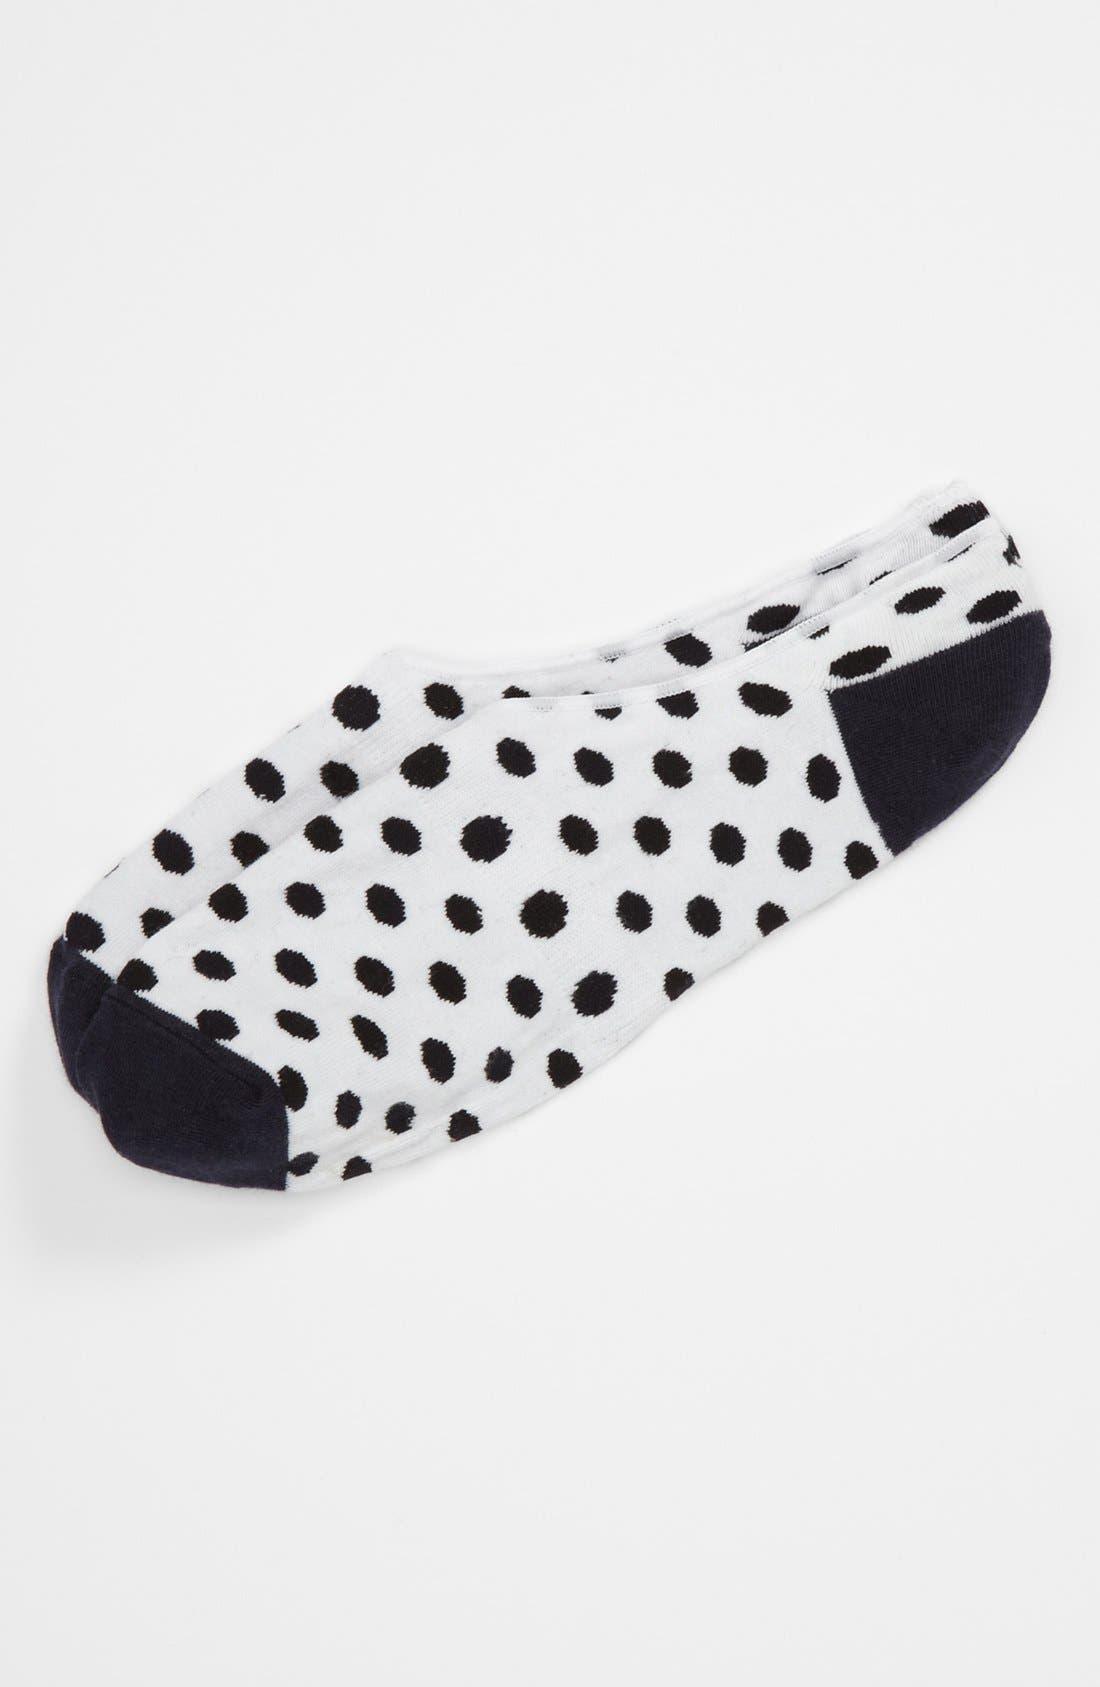 LORENZO UOMO Dot No-Show Socks, Main, color, 100